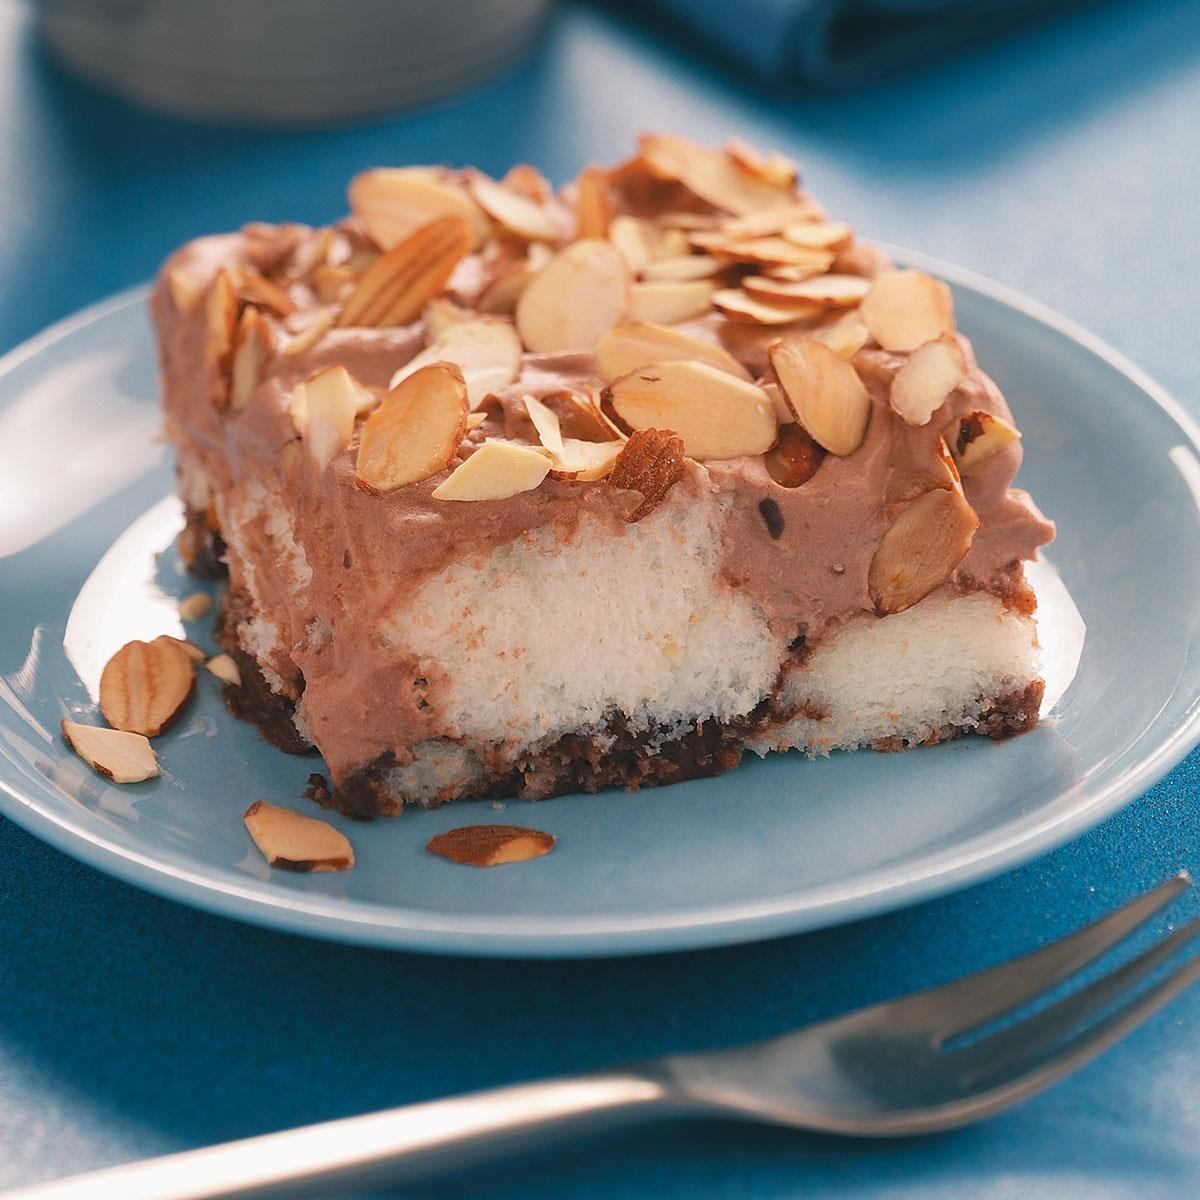 Chocolate Almond Dessert Recipe | Taste of Home